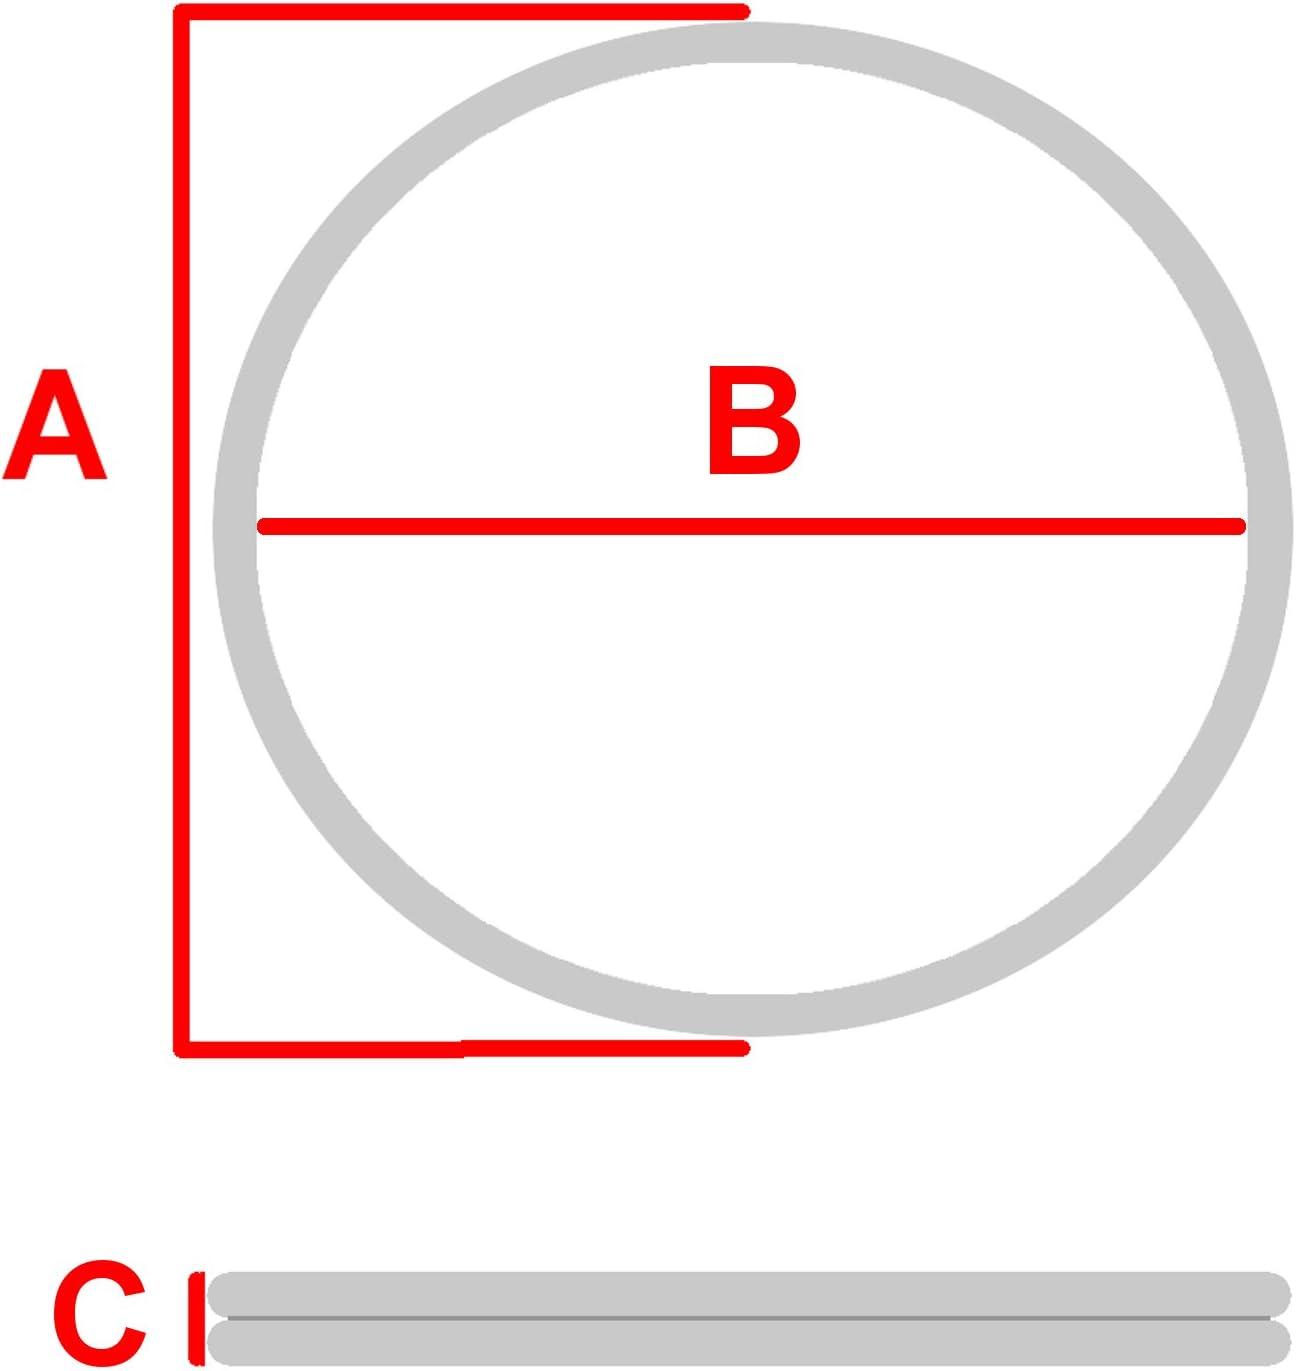 BIG-SAM 80021 10 mm hasta 50 mm, 5, 10, 25, 50 o 100 unidades Anillos para llaves